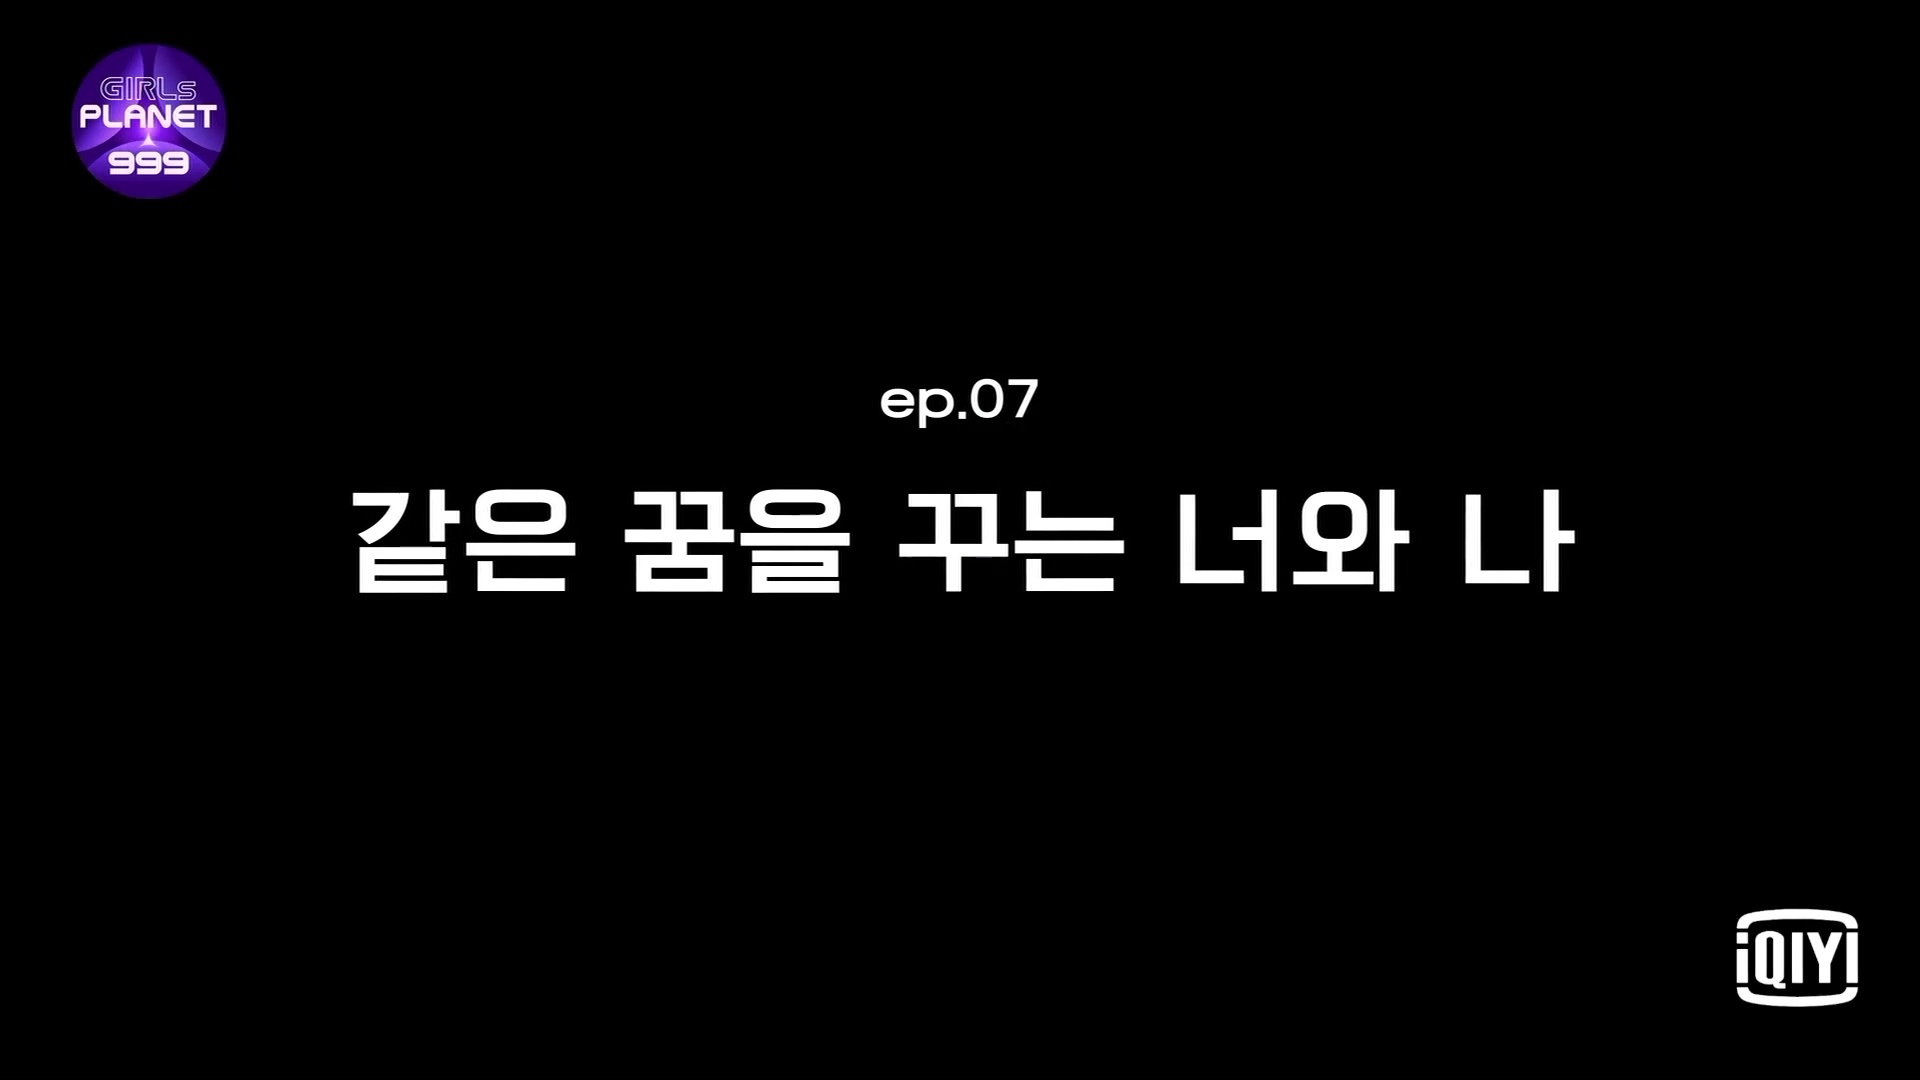 GIRLS-PLANET-999-EP-7-1